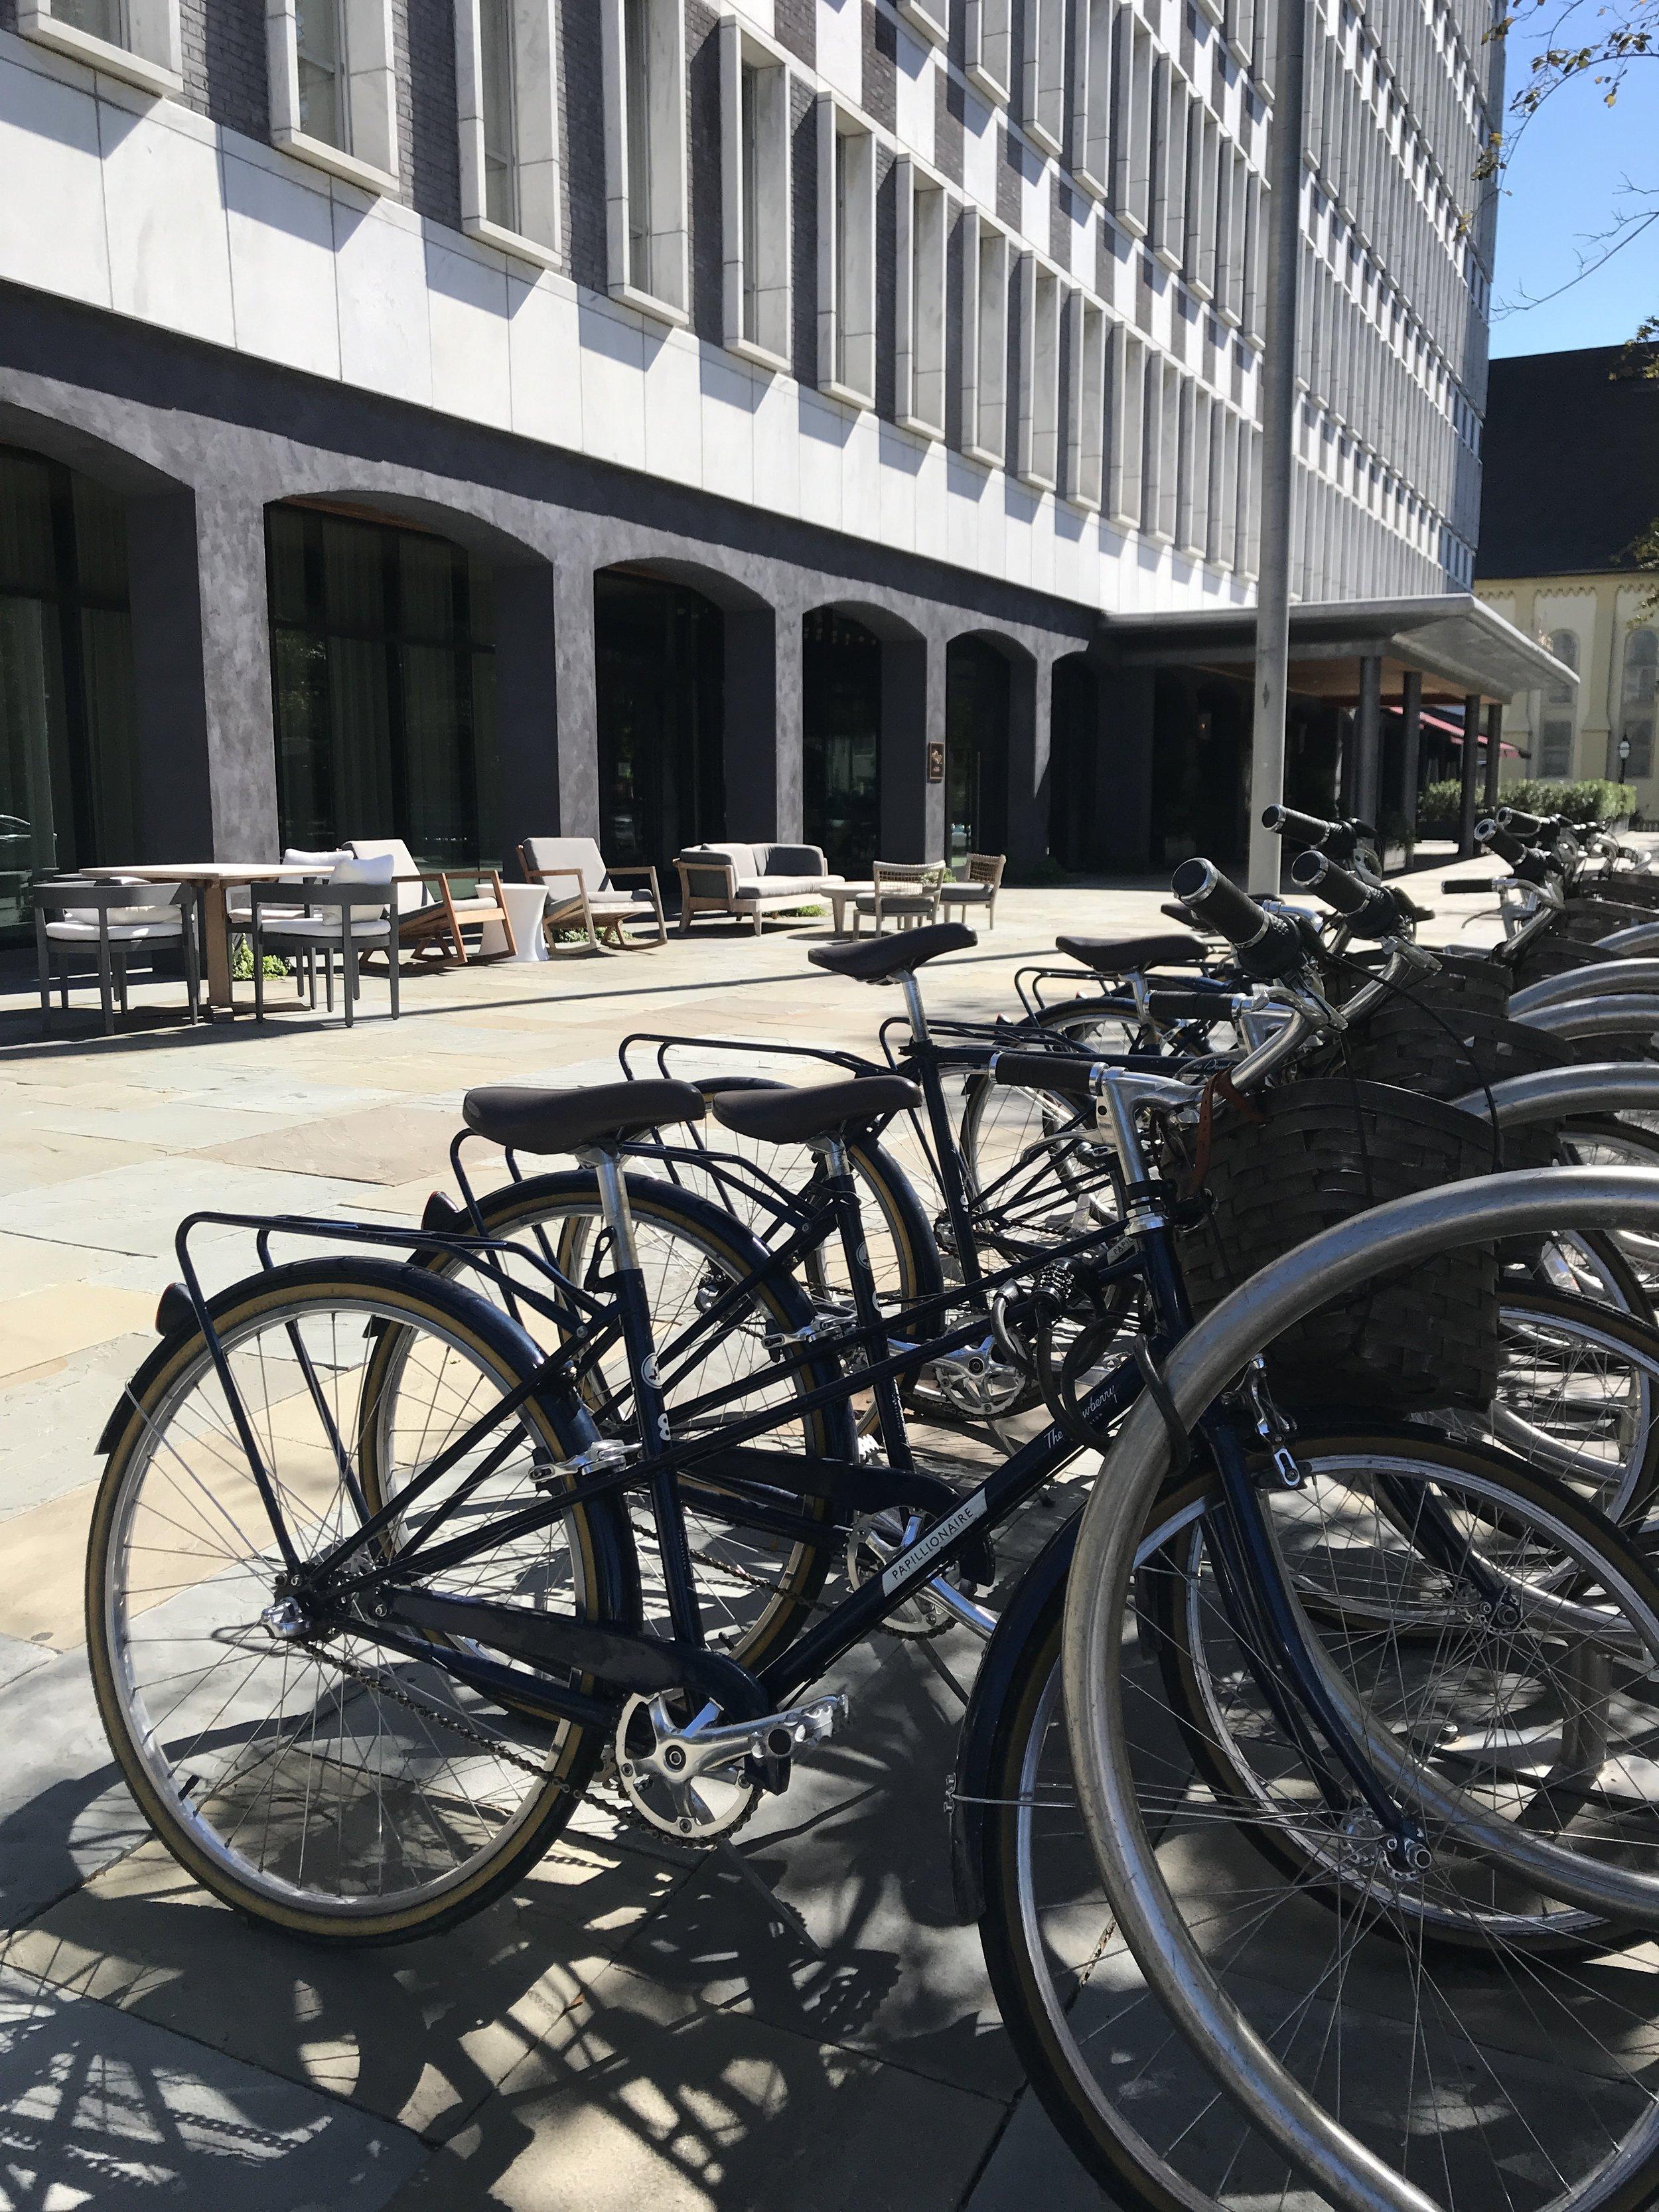 Bicycles to borrow.